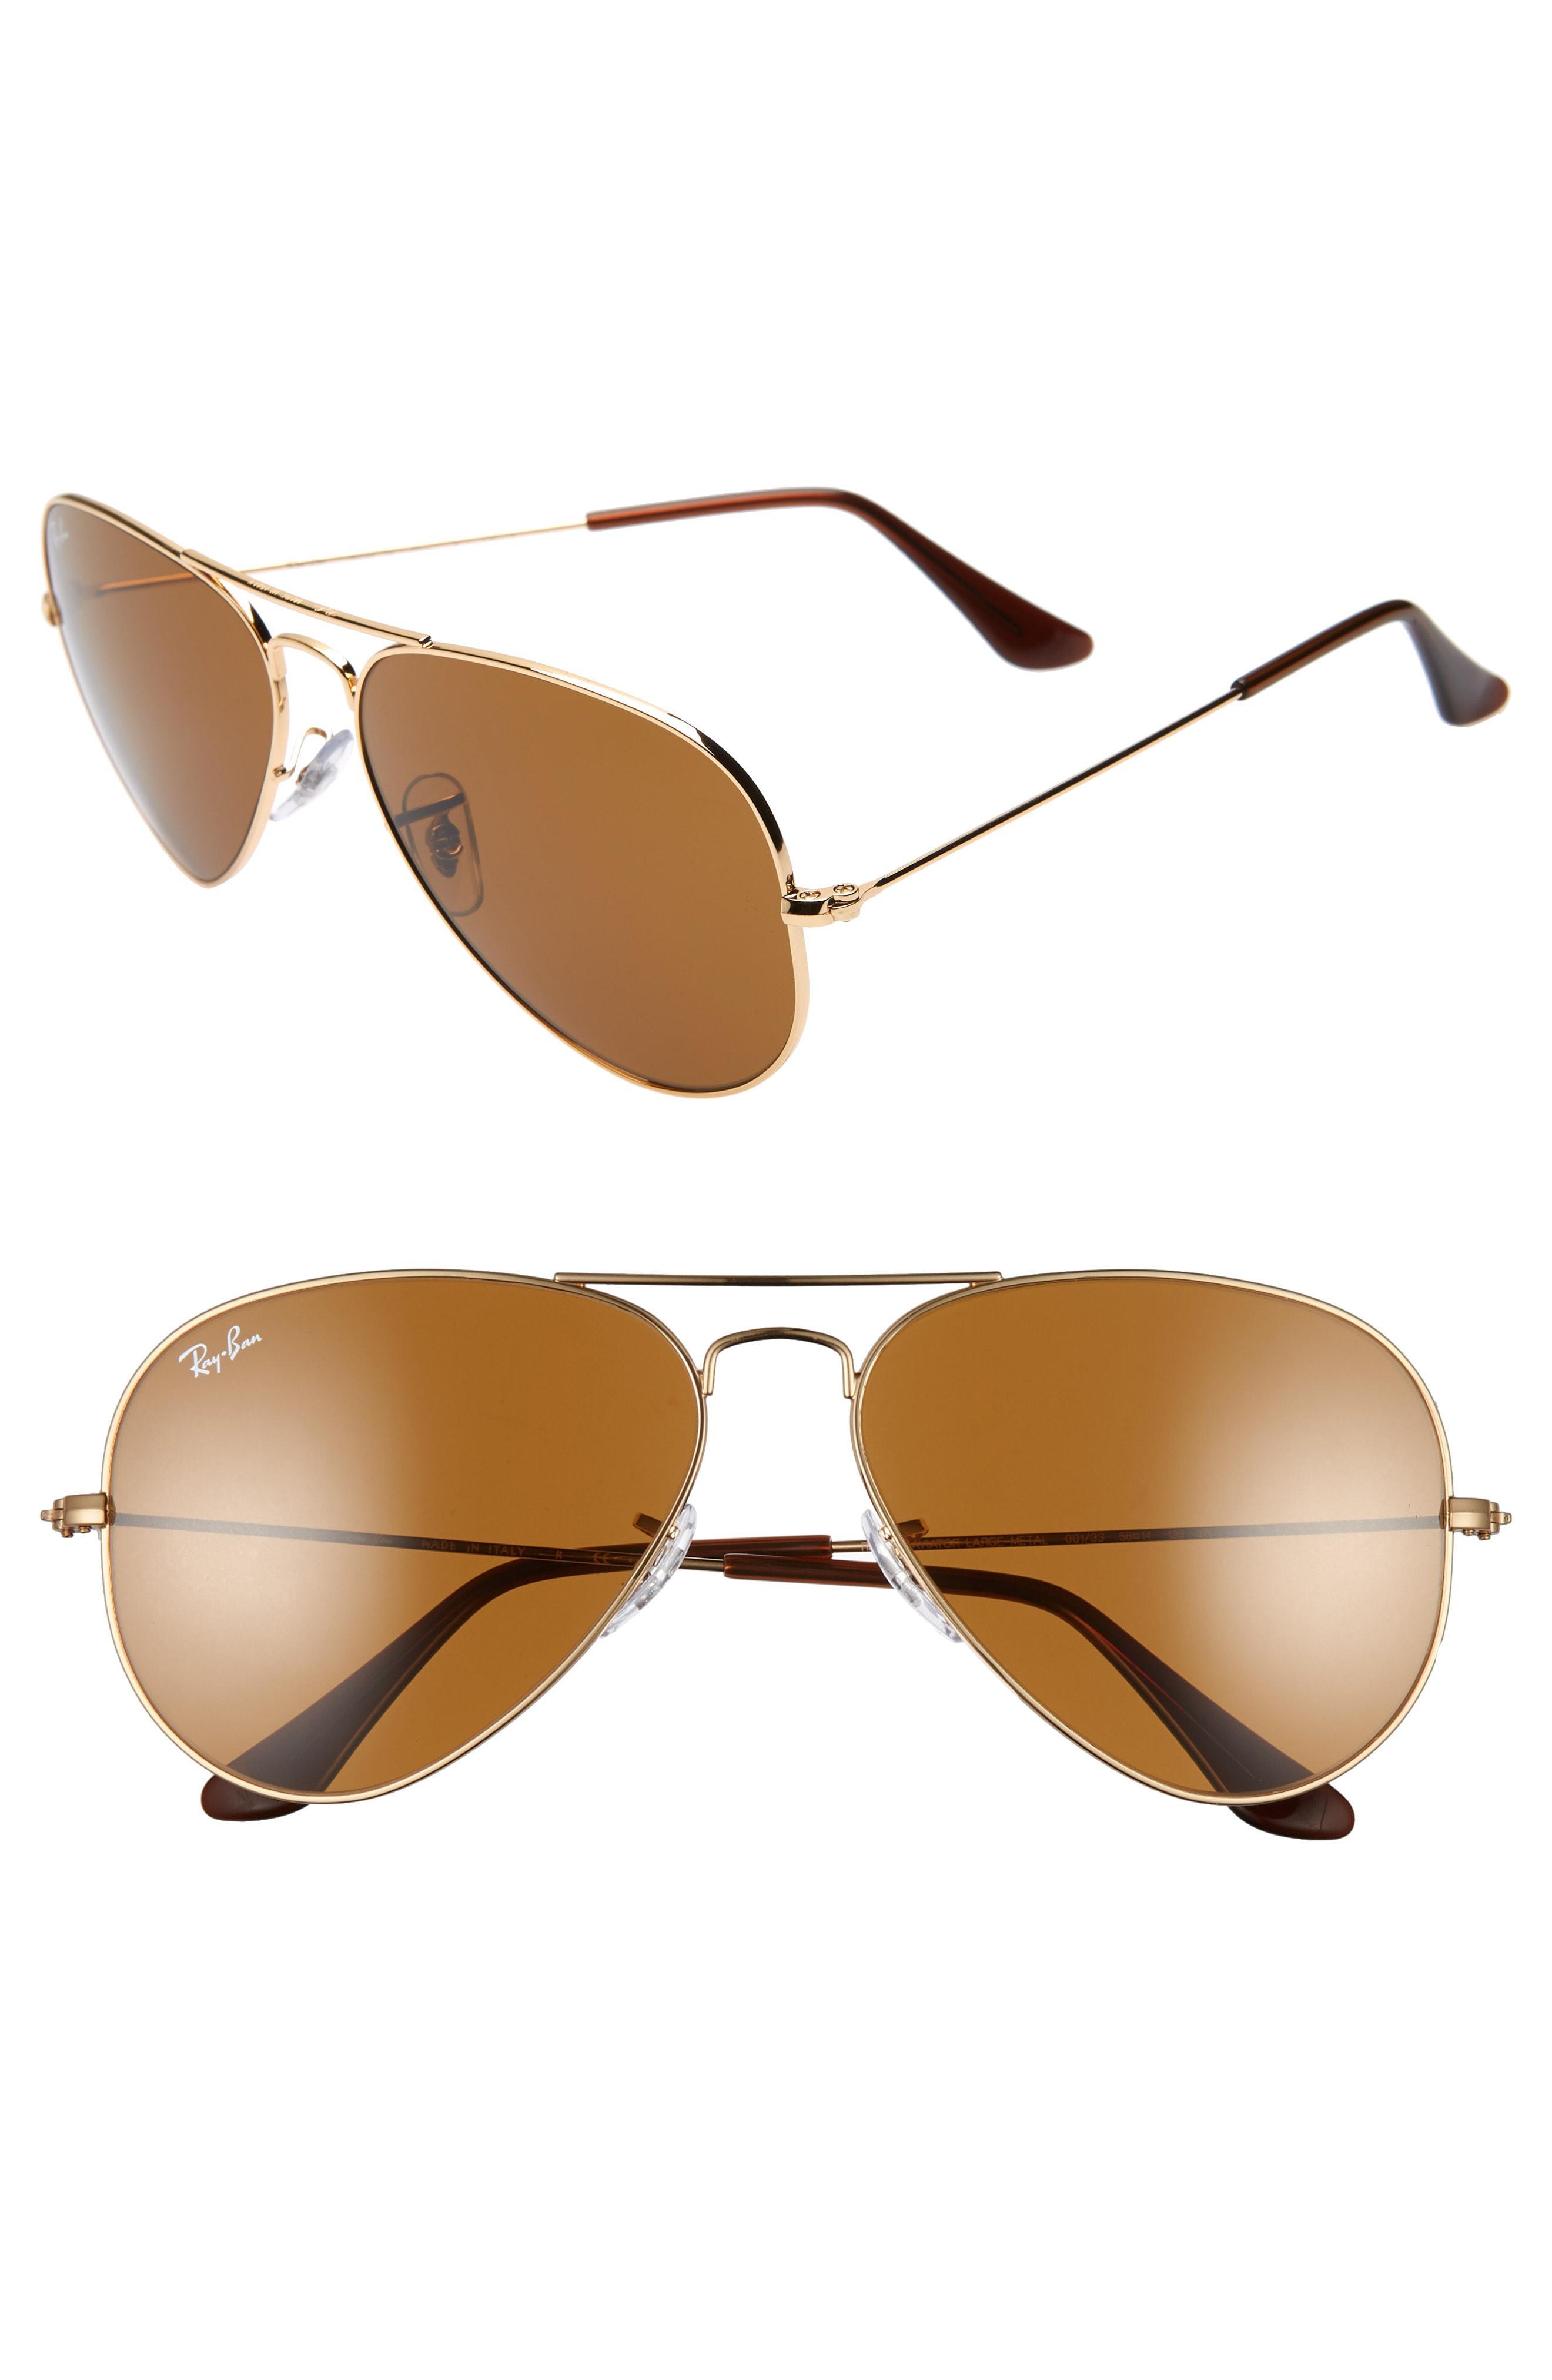 4a38a05e9ea Lyst - Ray-Ban Standard Original 58mm Aviator Sunglasses in Blue